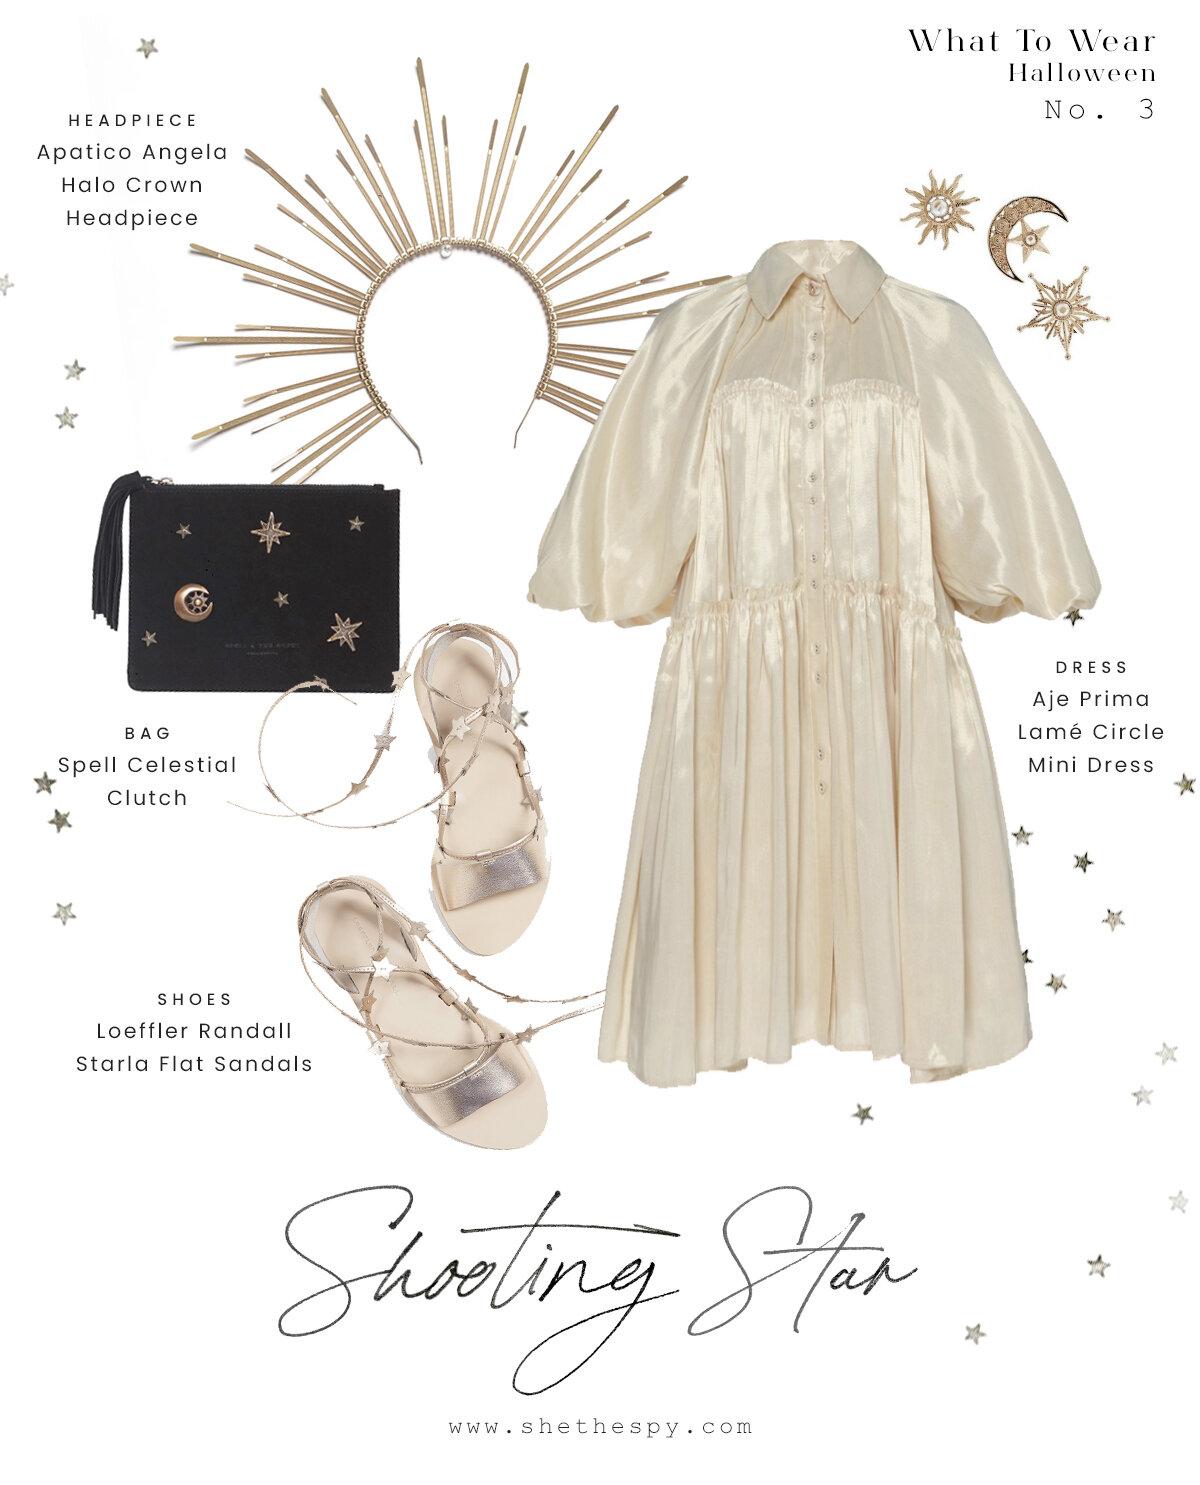 shethespy-halloween-outfit-shooting-star.jpg